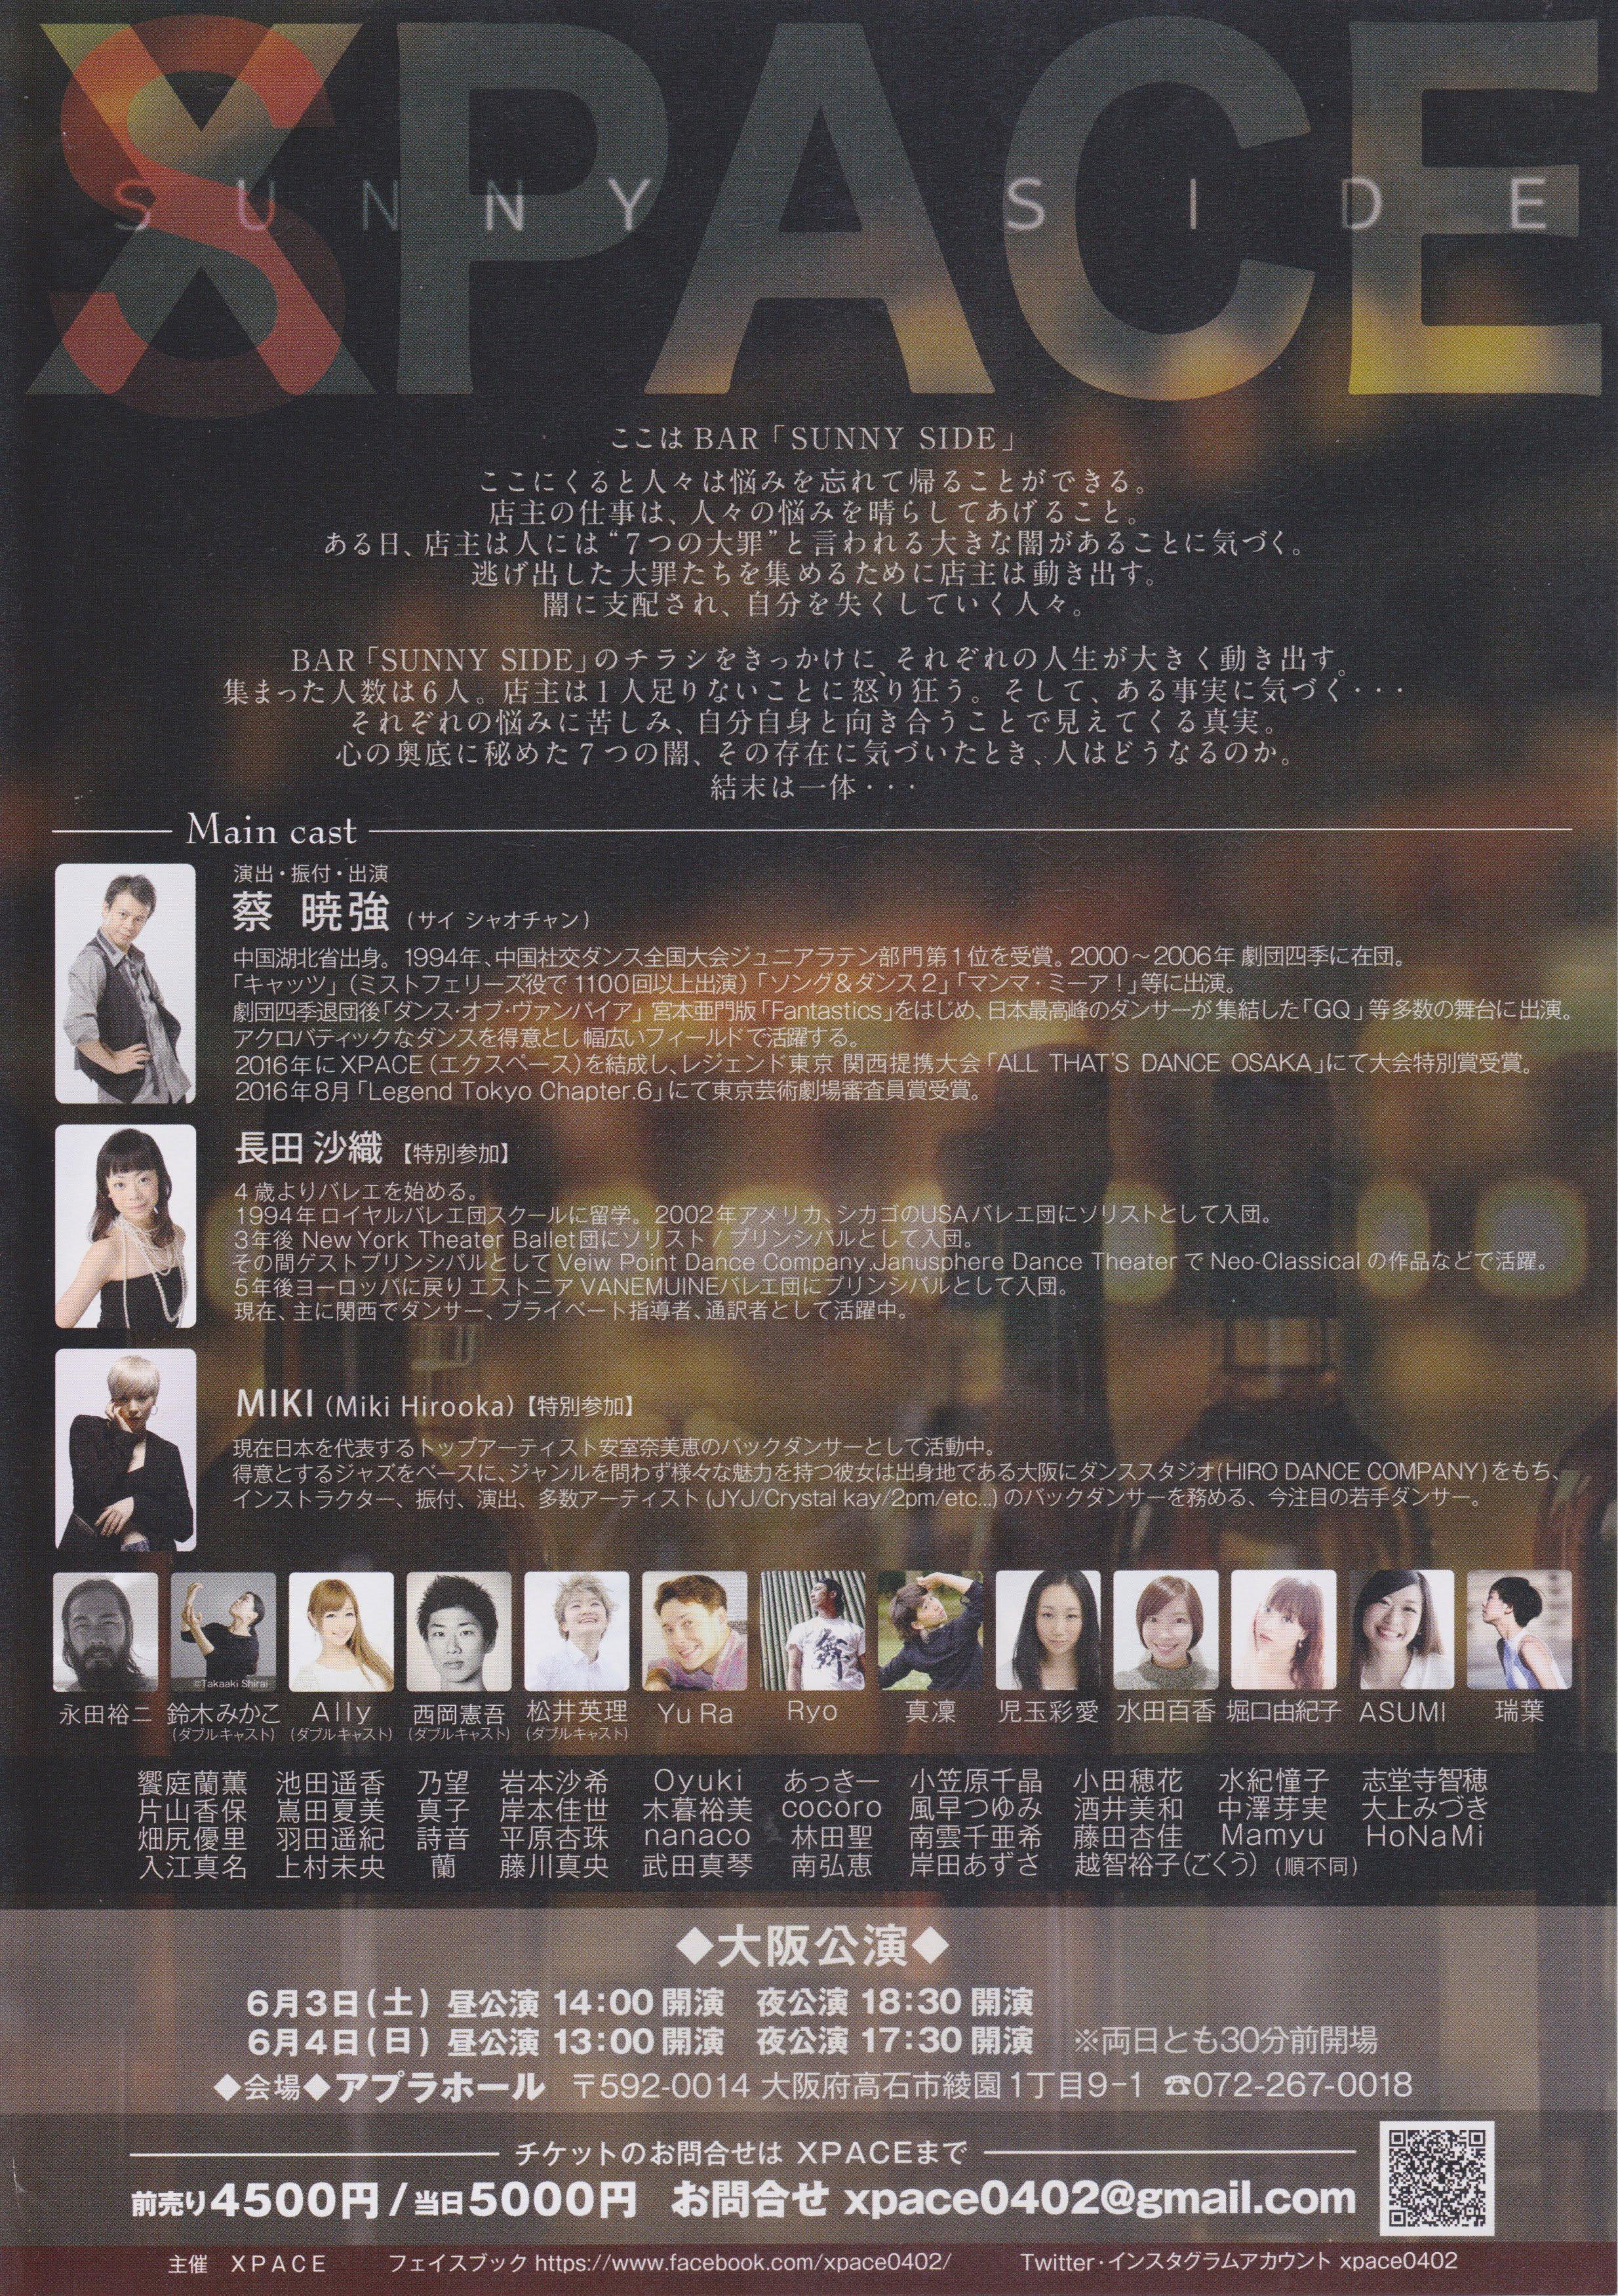 【2017-06-03】XSPACE SUNNY SIDE 大阪公演_裏